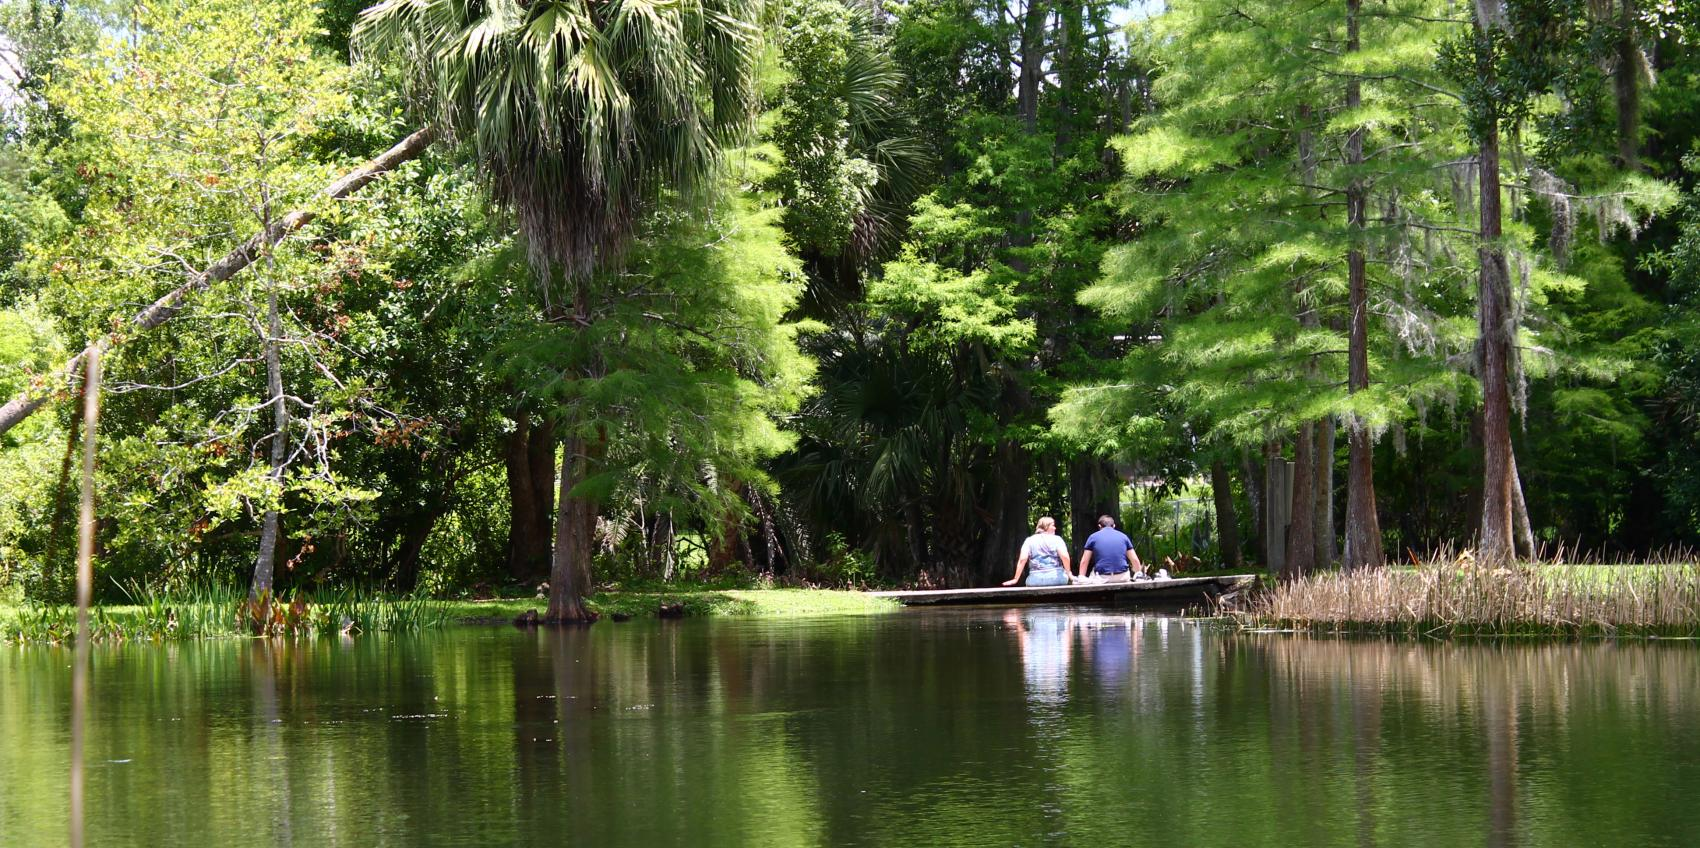 Mead Botanical Garden American Public Gardens Association